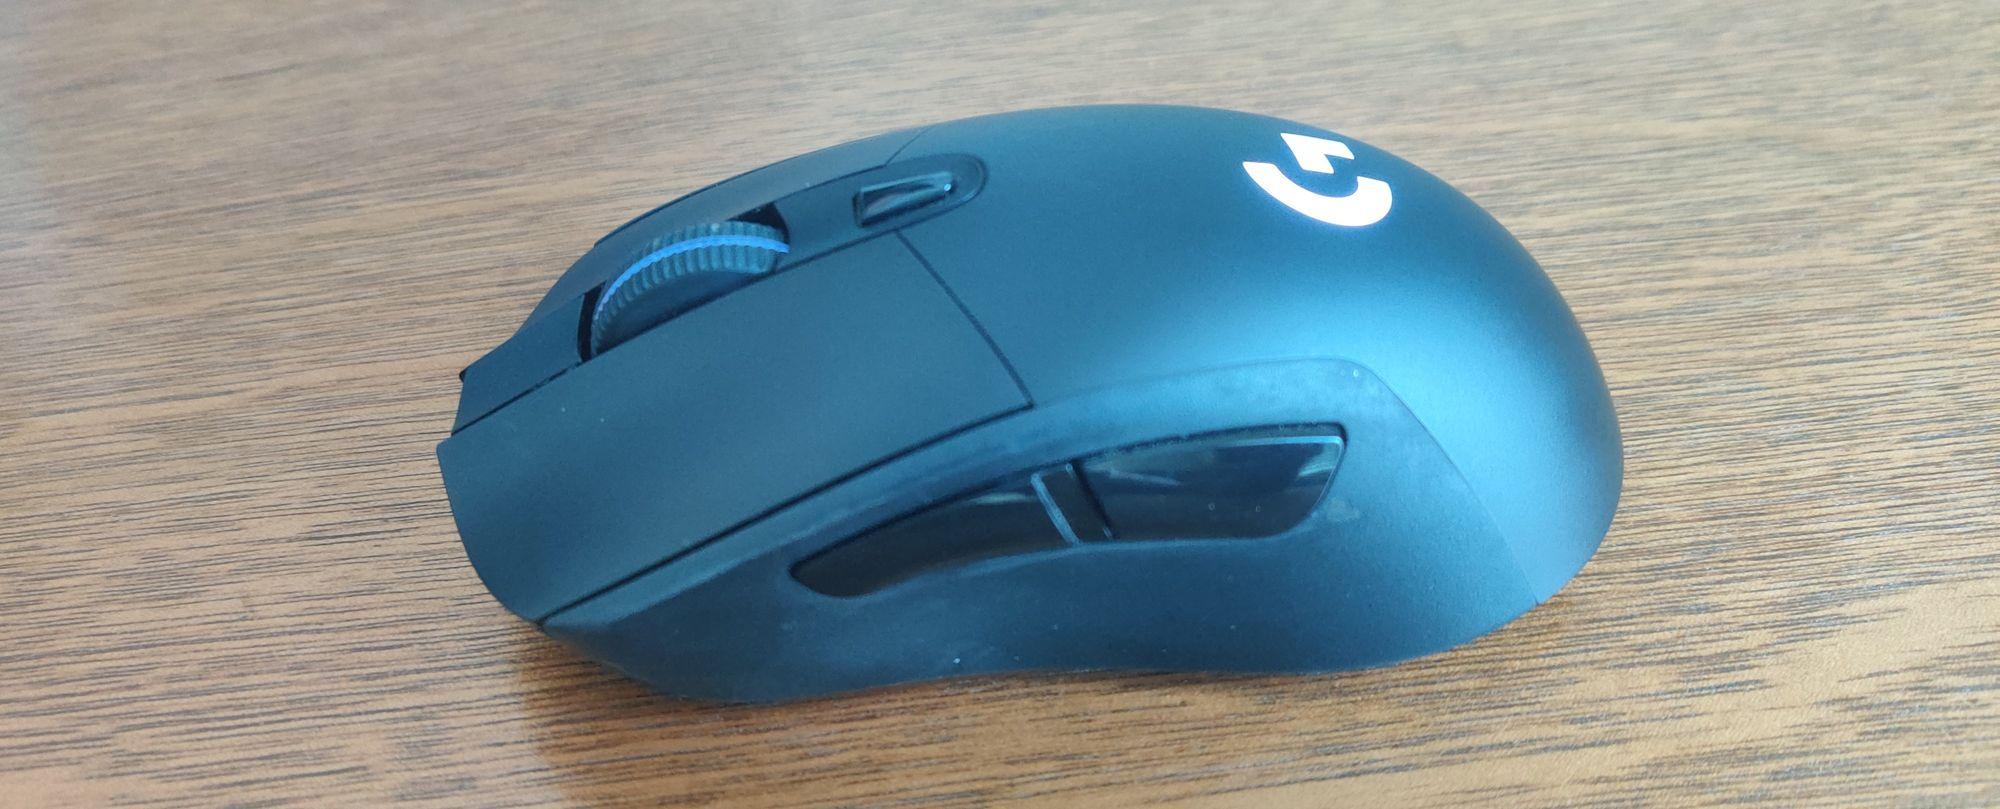 logitech g403 wireless mouse